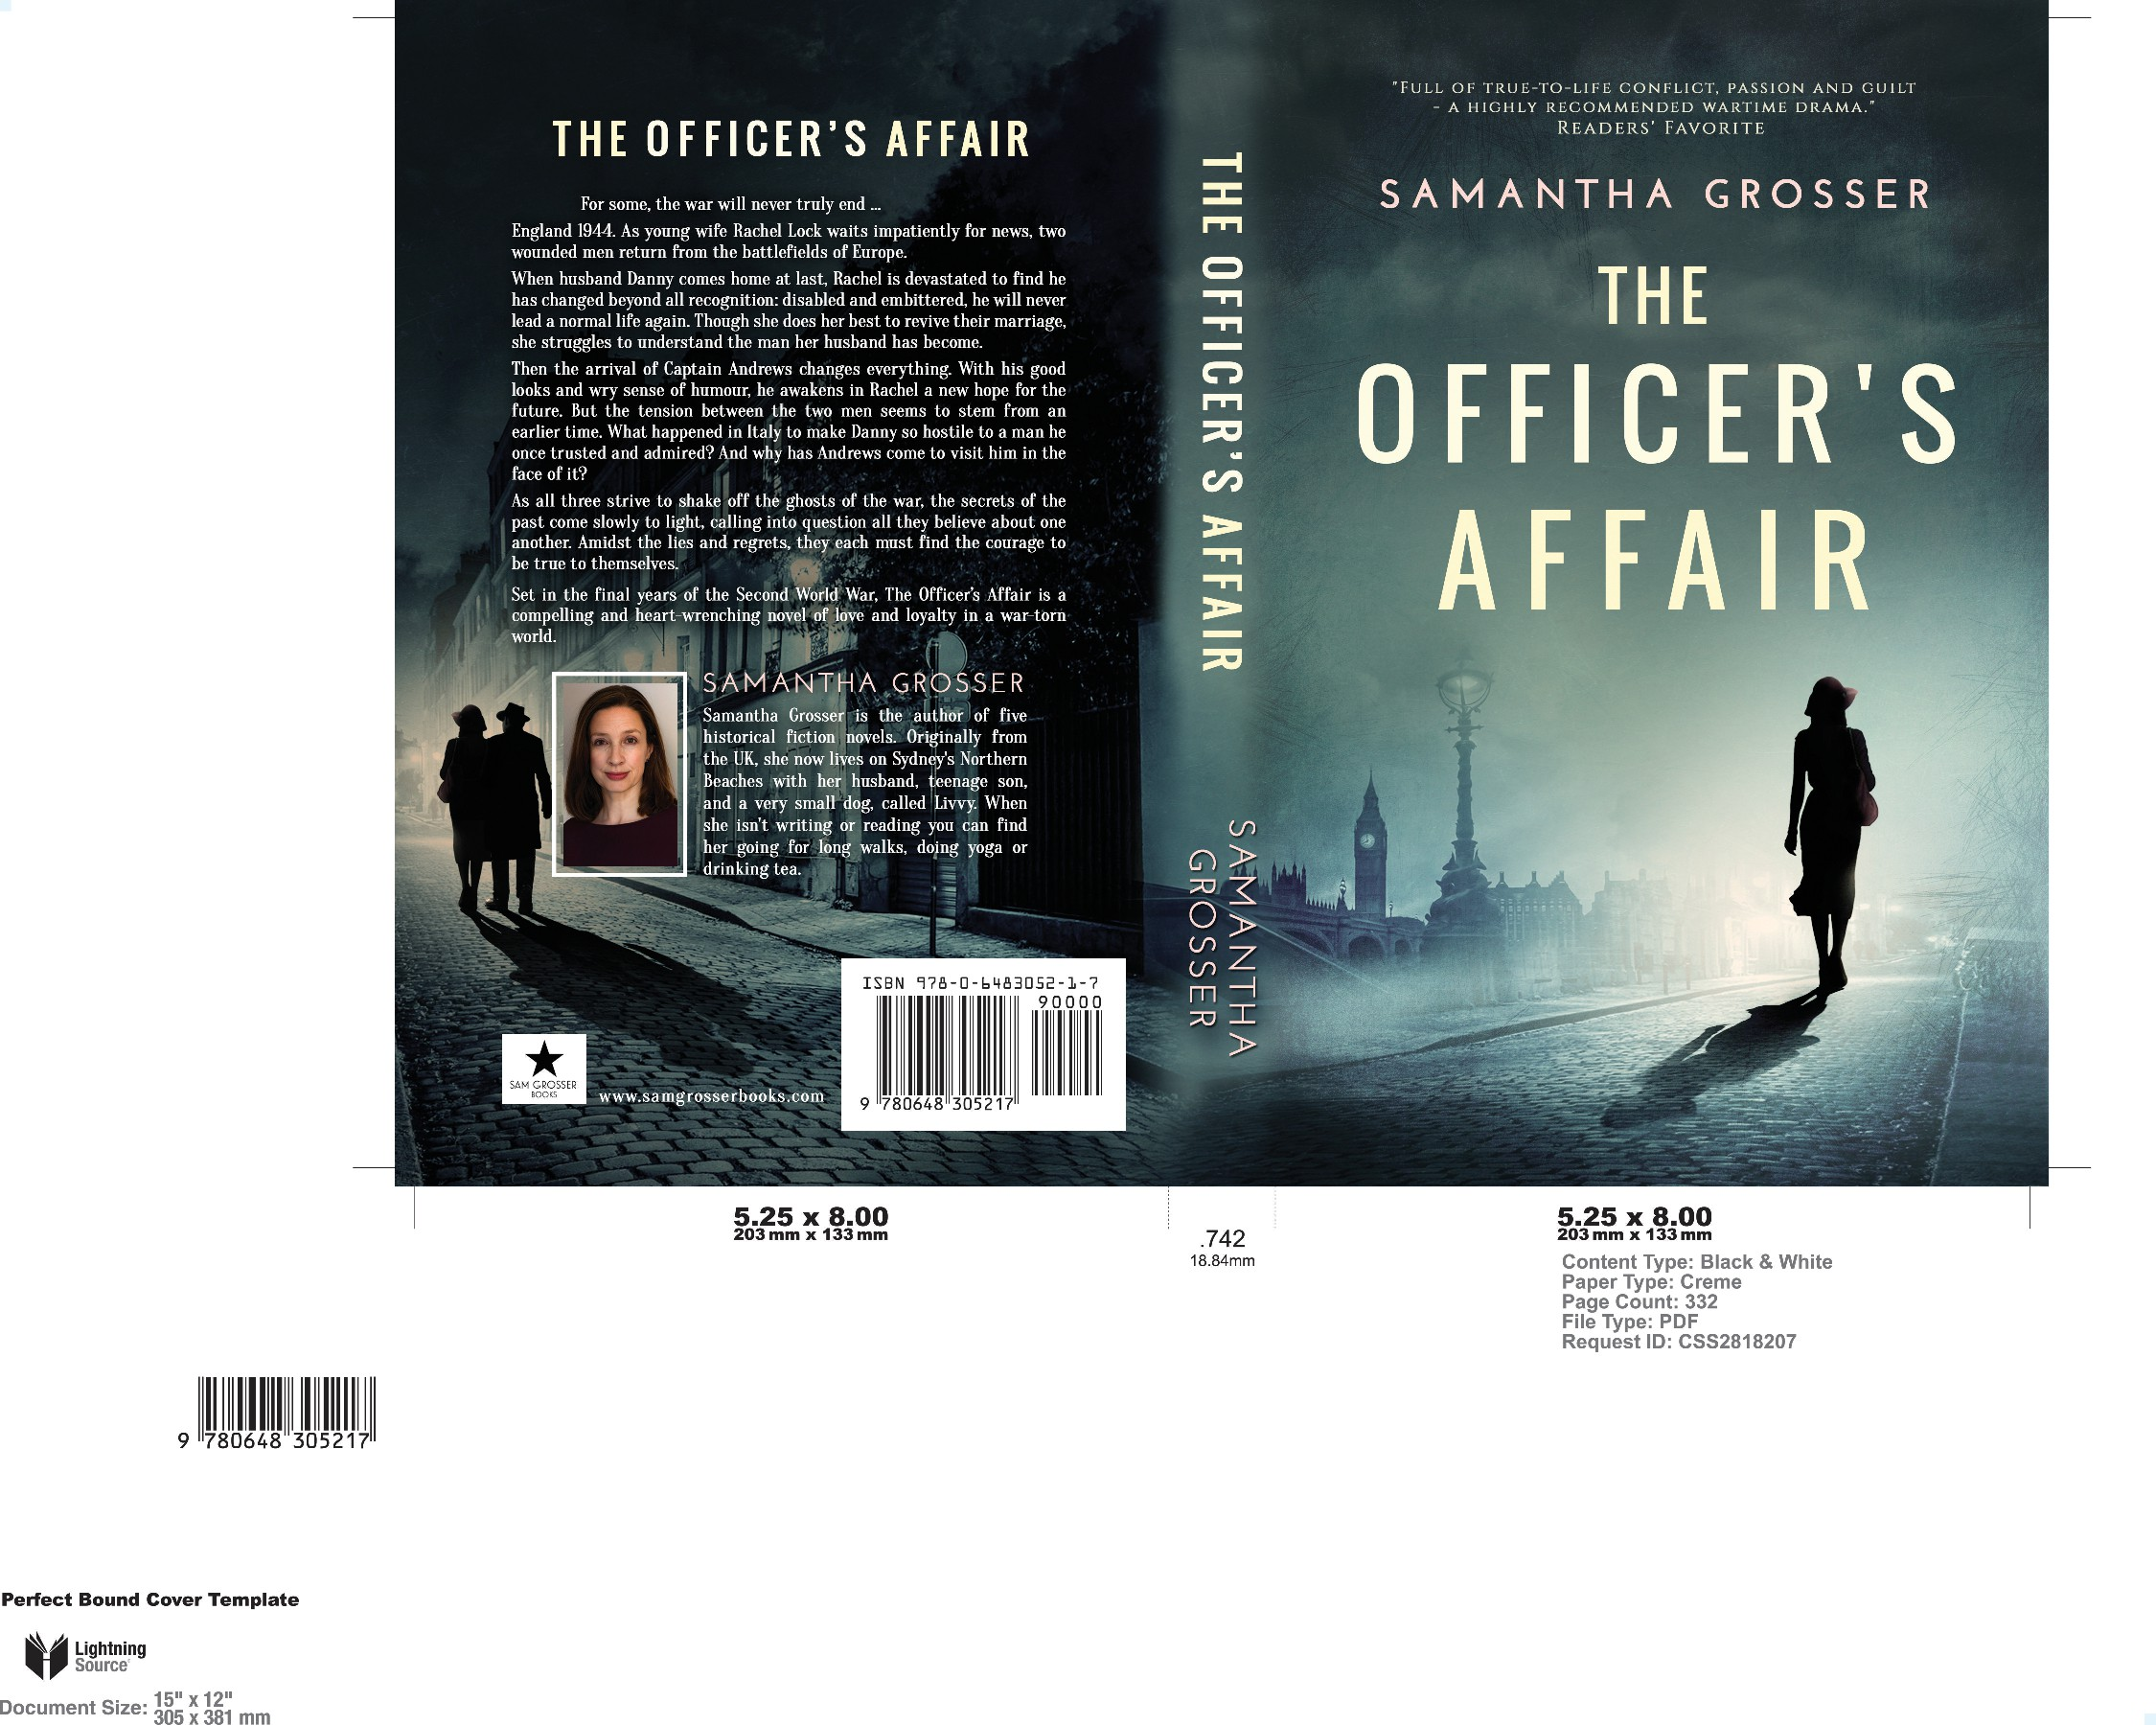 Genre-perfect book cover for World War II drama